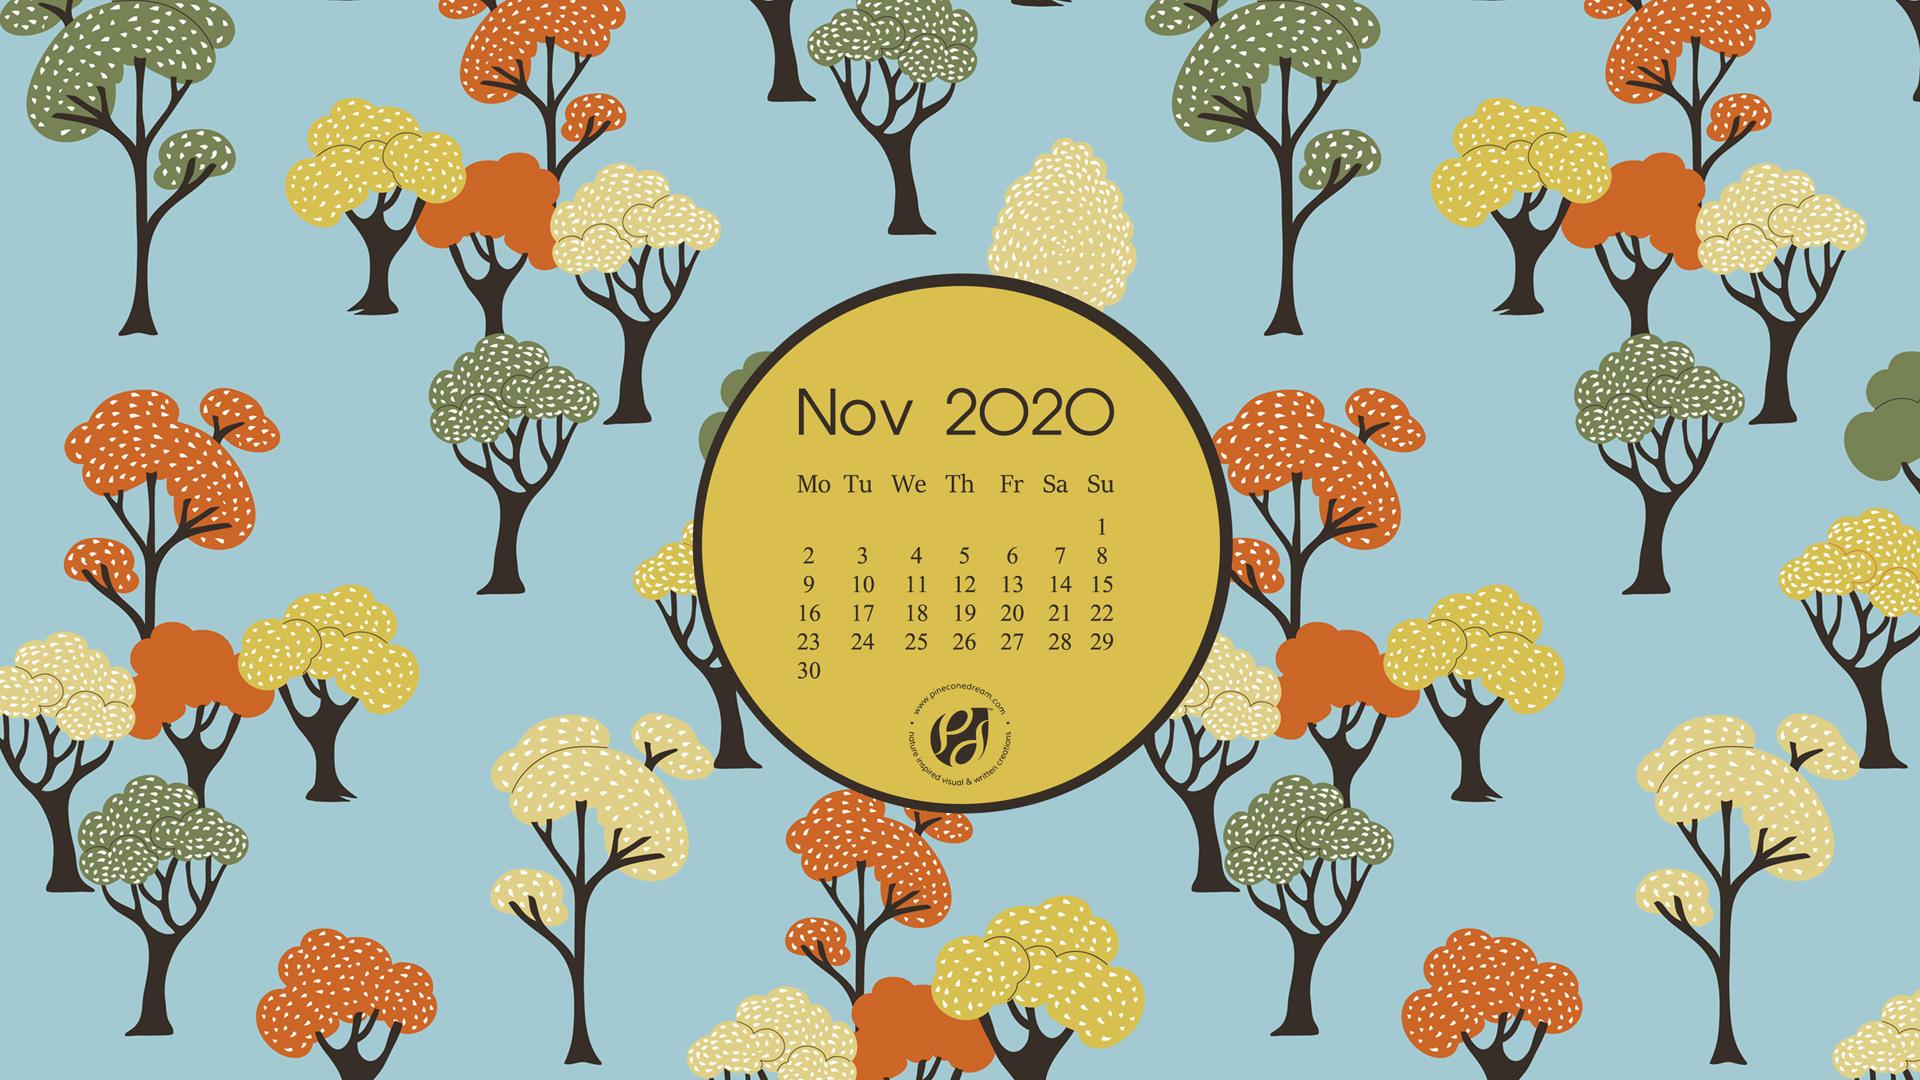 Nov2020 Desktop1 Pineconedream